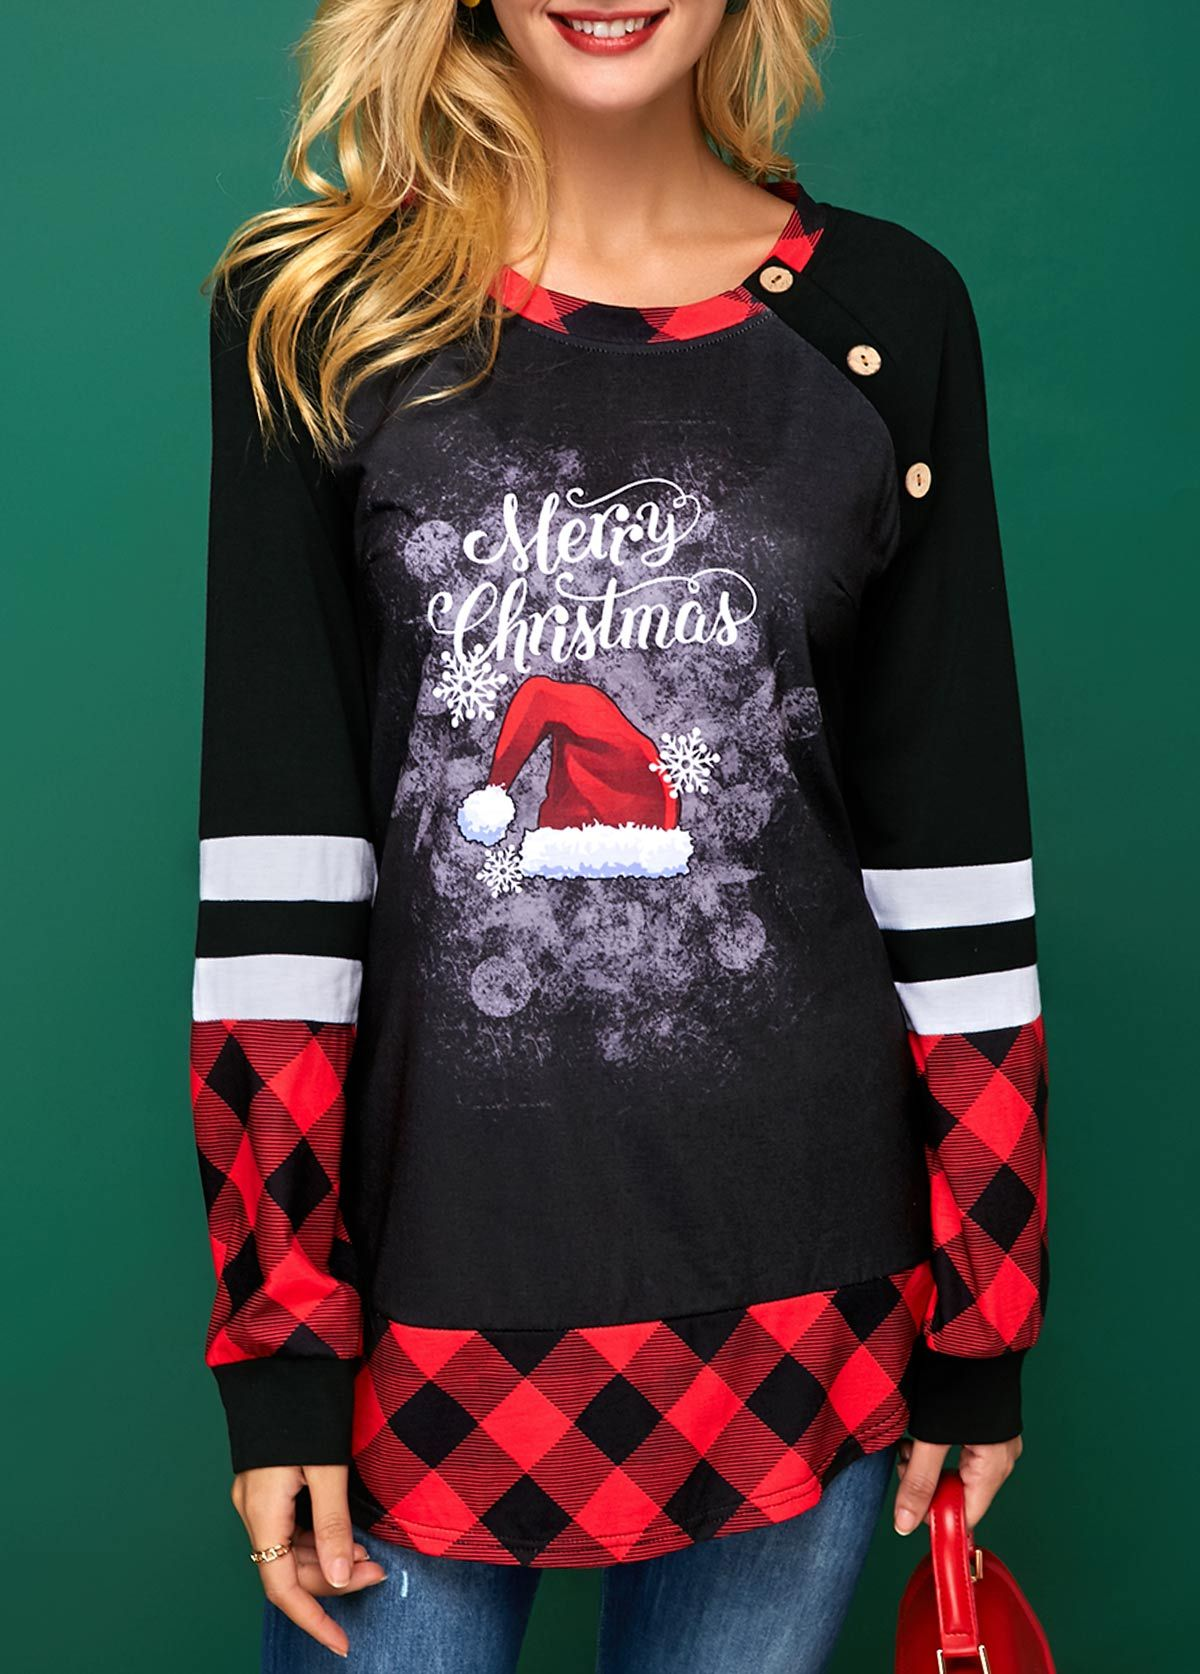 c0217ec31 Cheap womens trendy tops Tops online for sale. Button Detail Long Sleeve Christmas  T Shirt   modlily.com - USD $25.92